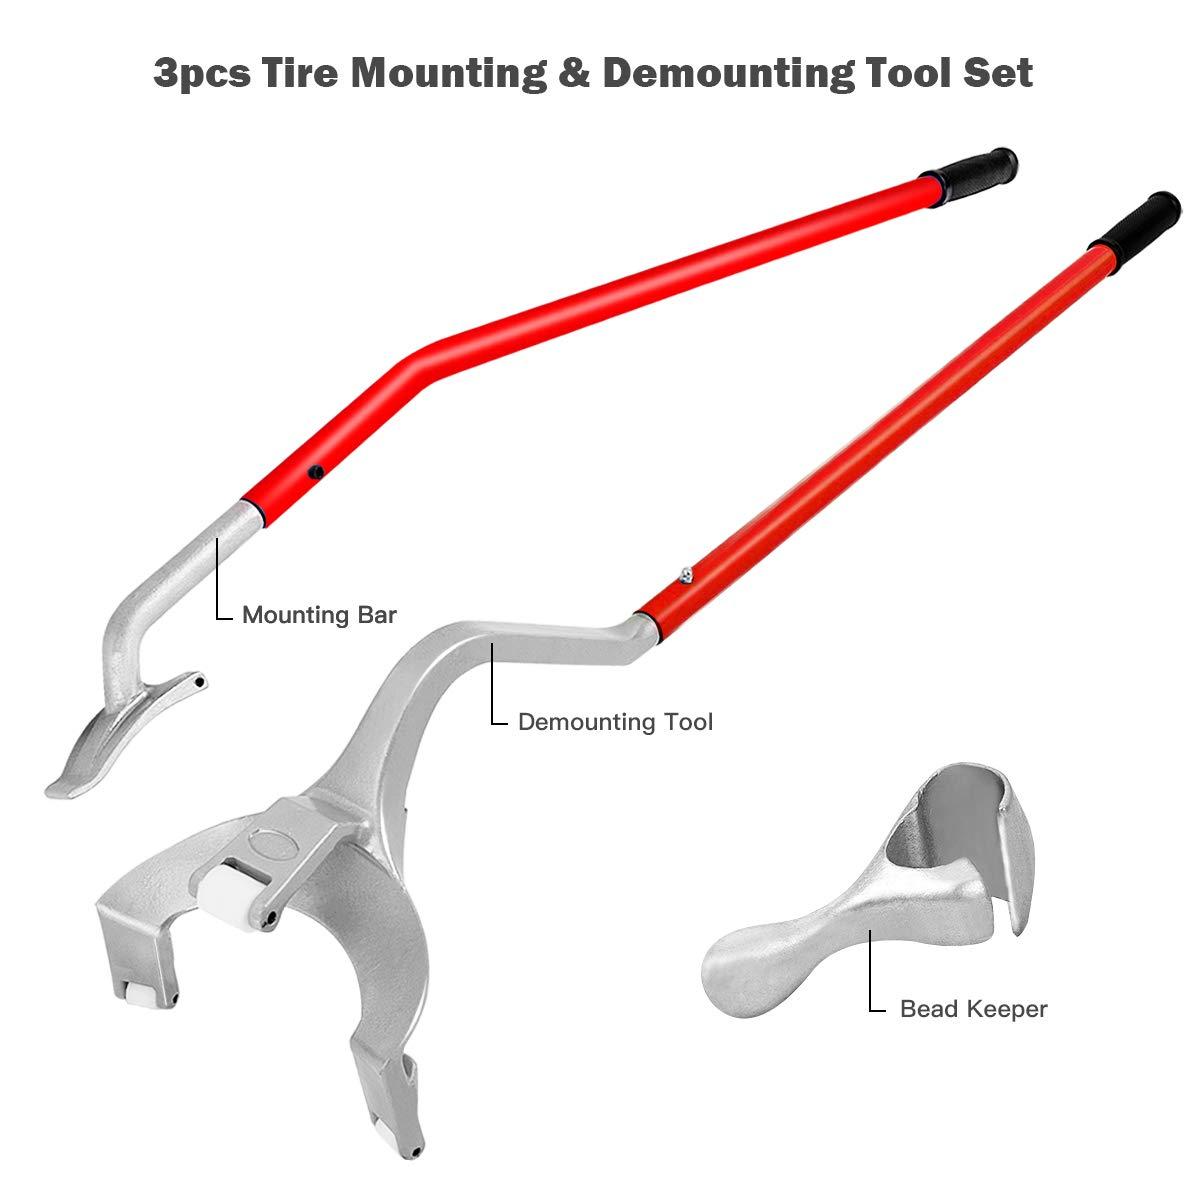 Goplus Tire Changer, 17.5'' to 24'' Steel Tire Mount Demount Tool Kit, Tubeless Truck Bead Breaker Manual Tire Changing Tool (Red) by Goplus (Image #4)